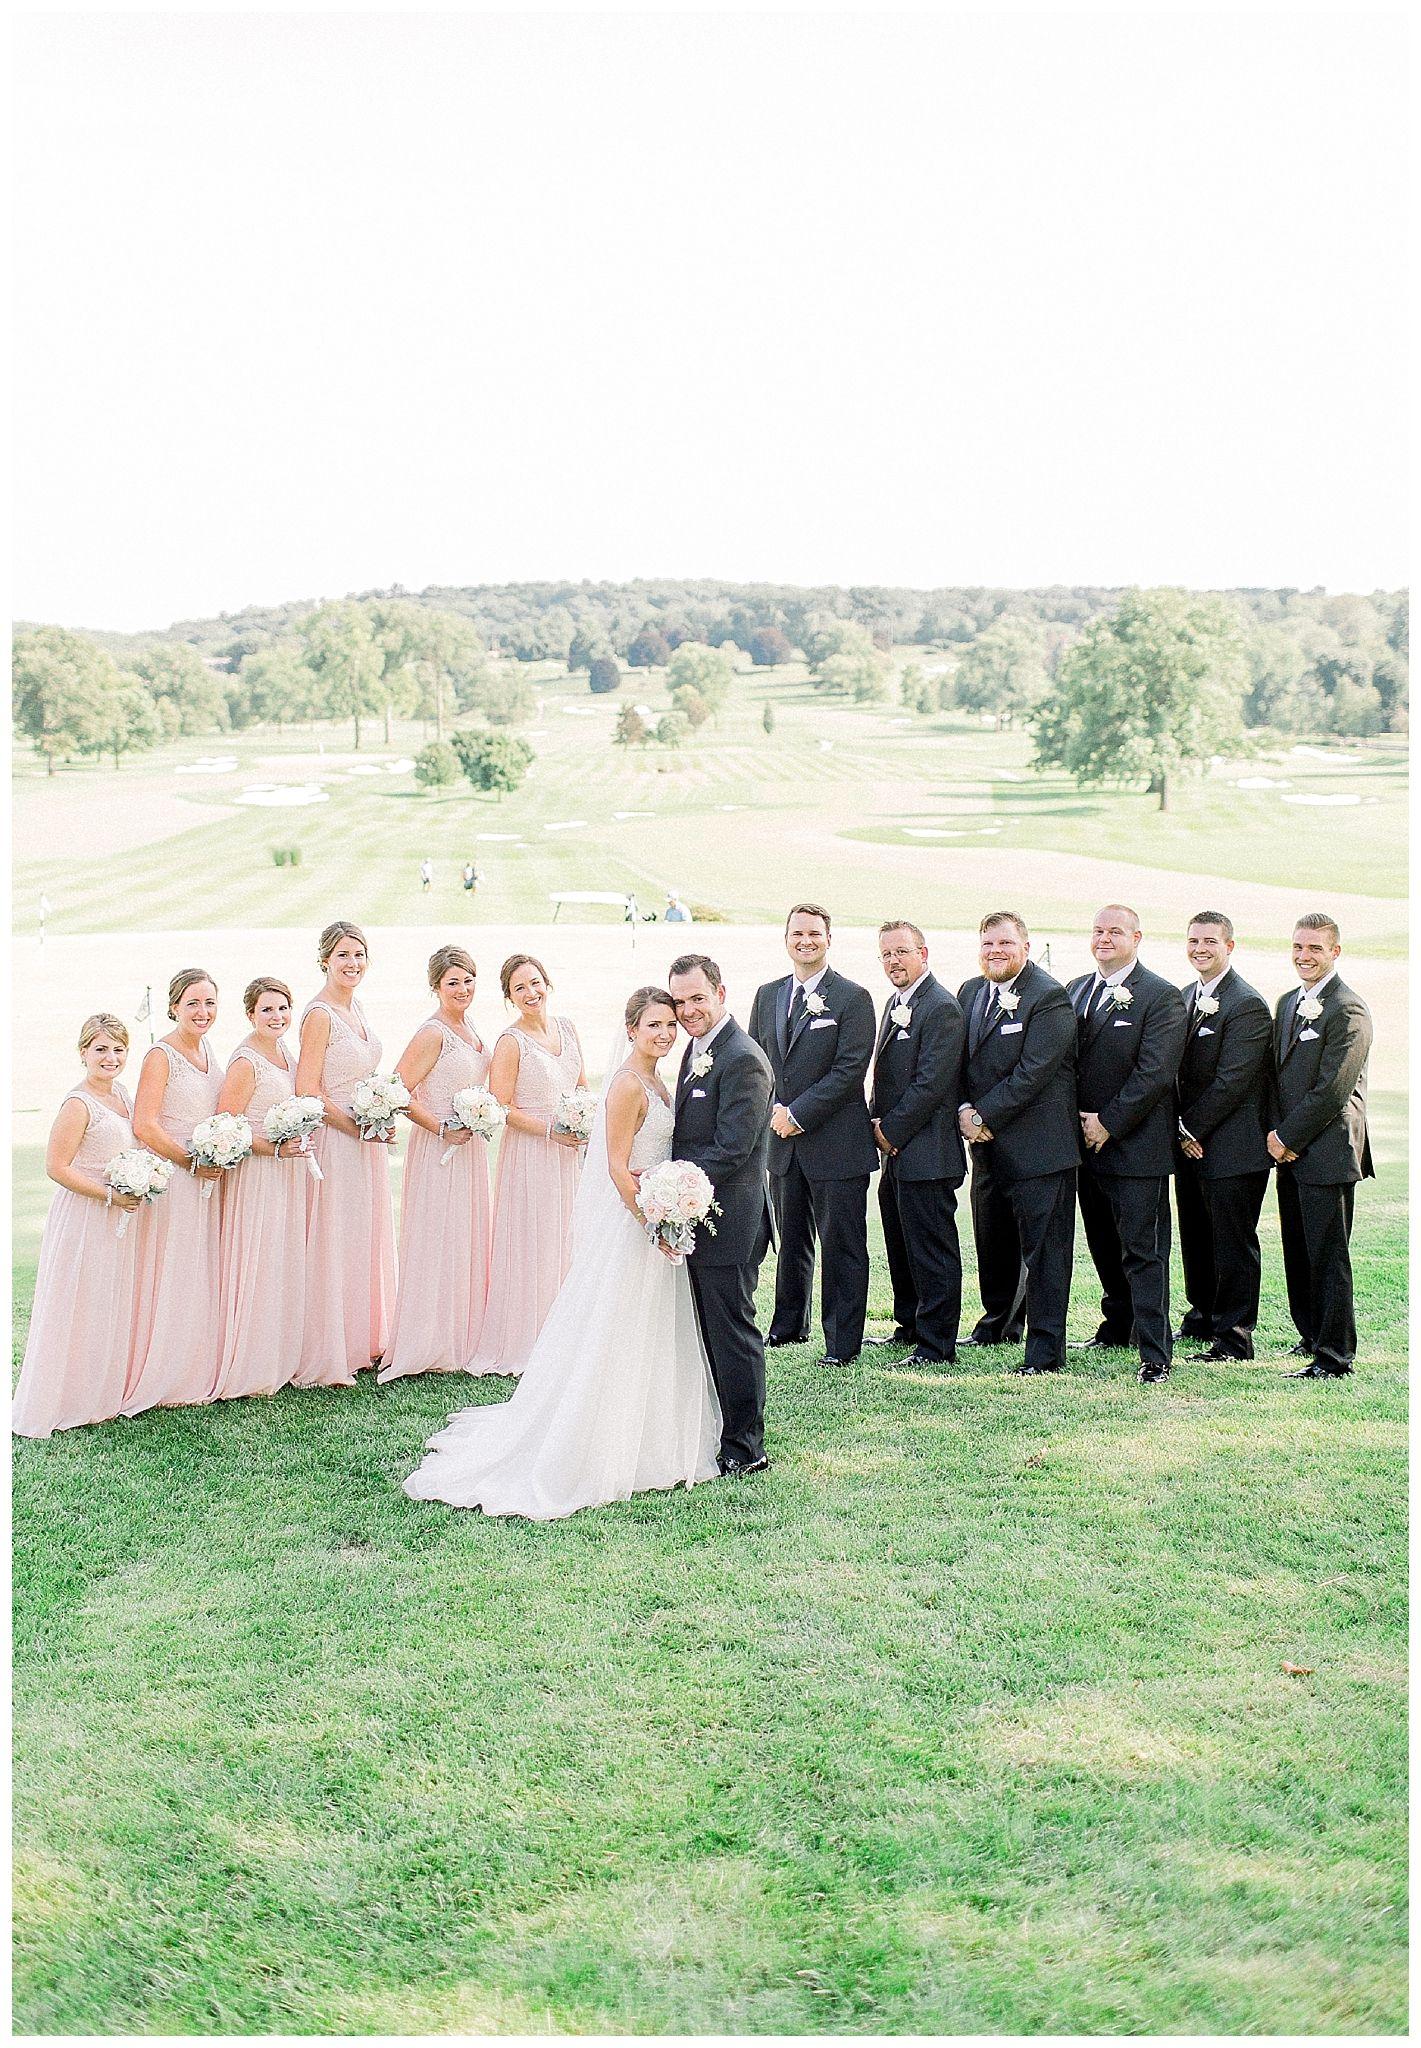 Whitemarsh valley country club wedding caroline morris photography